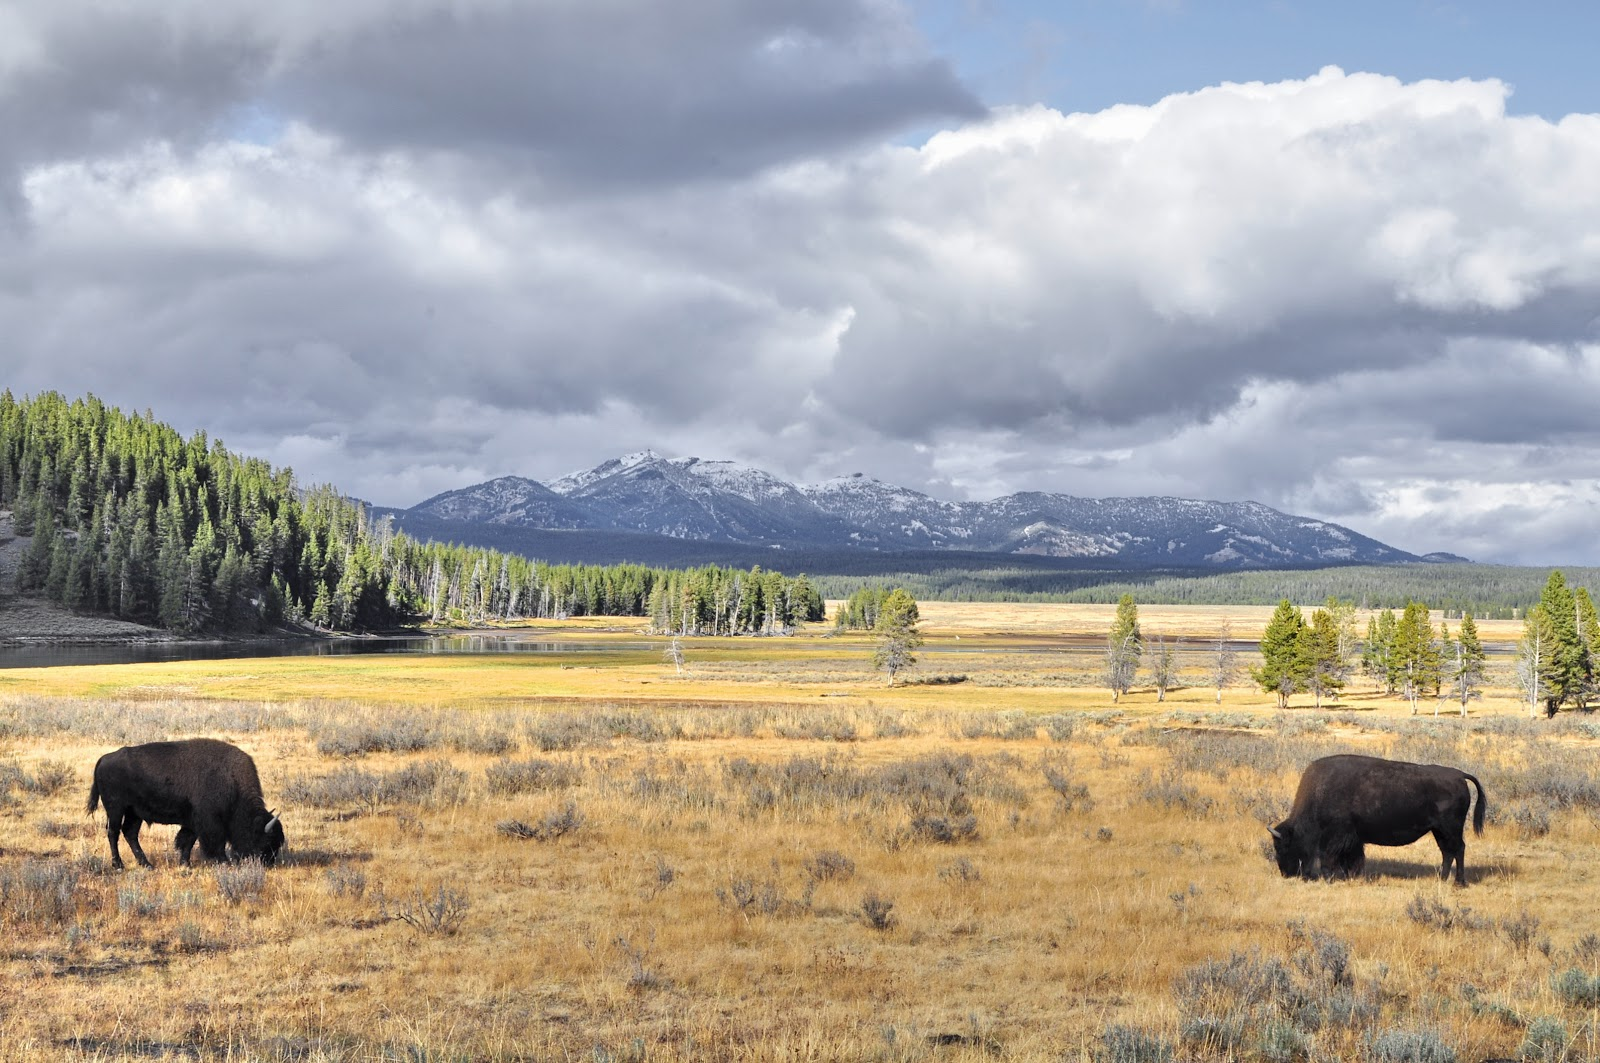 Western Fine Art Photography: Western Fine Art Photography